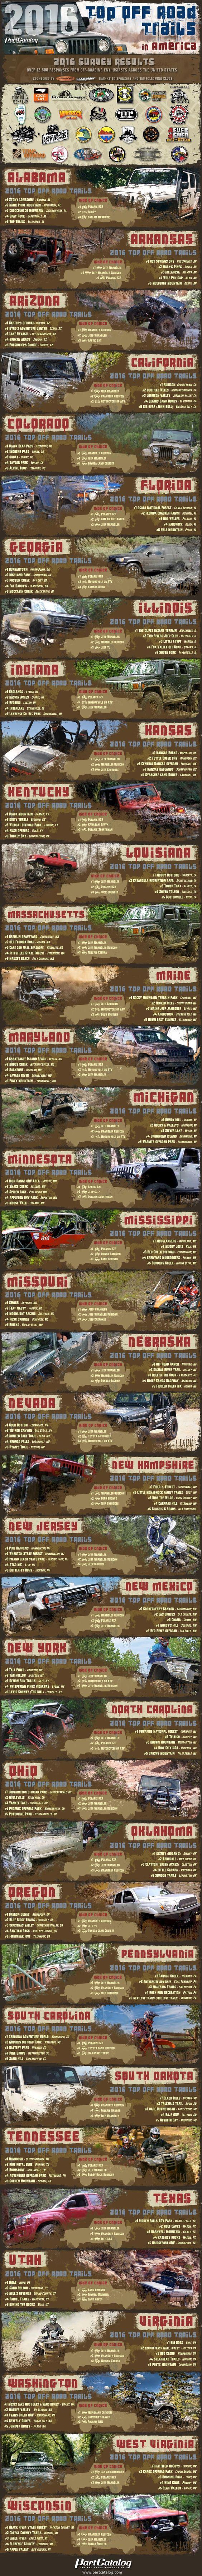 2016 Top Off Road Trails in America